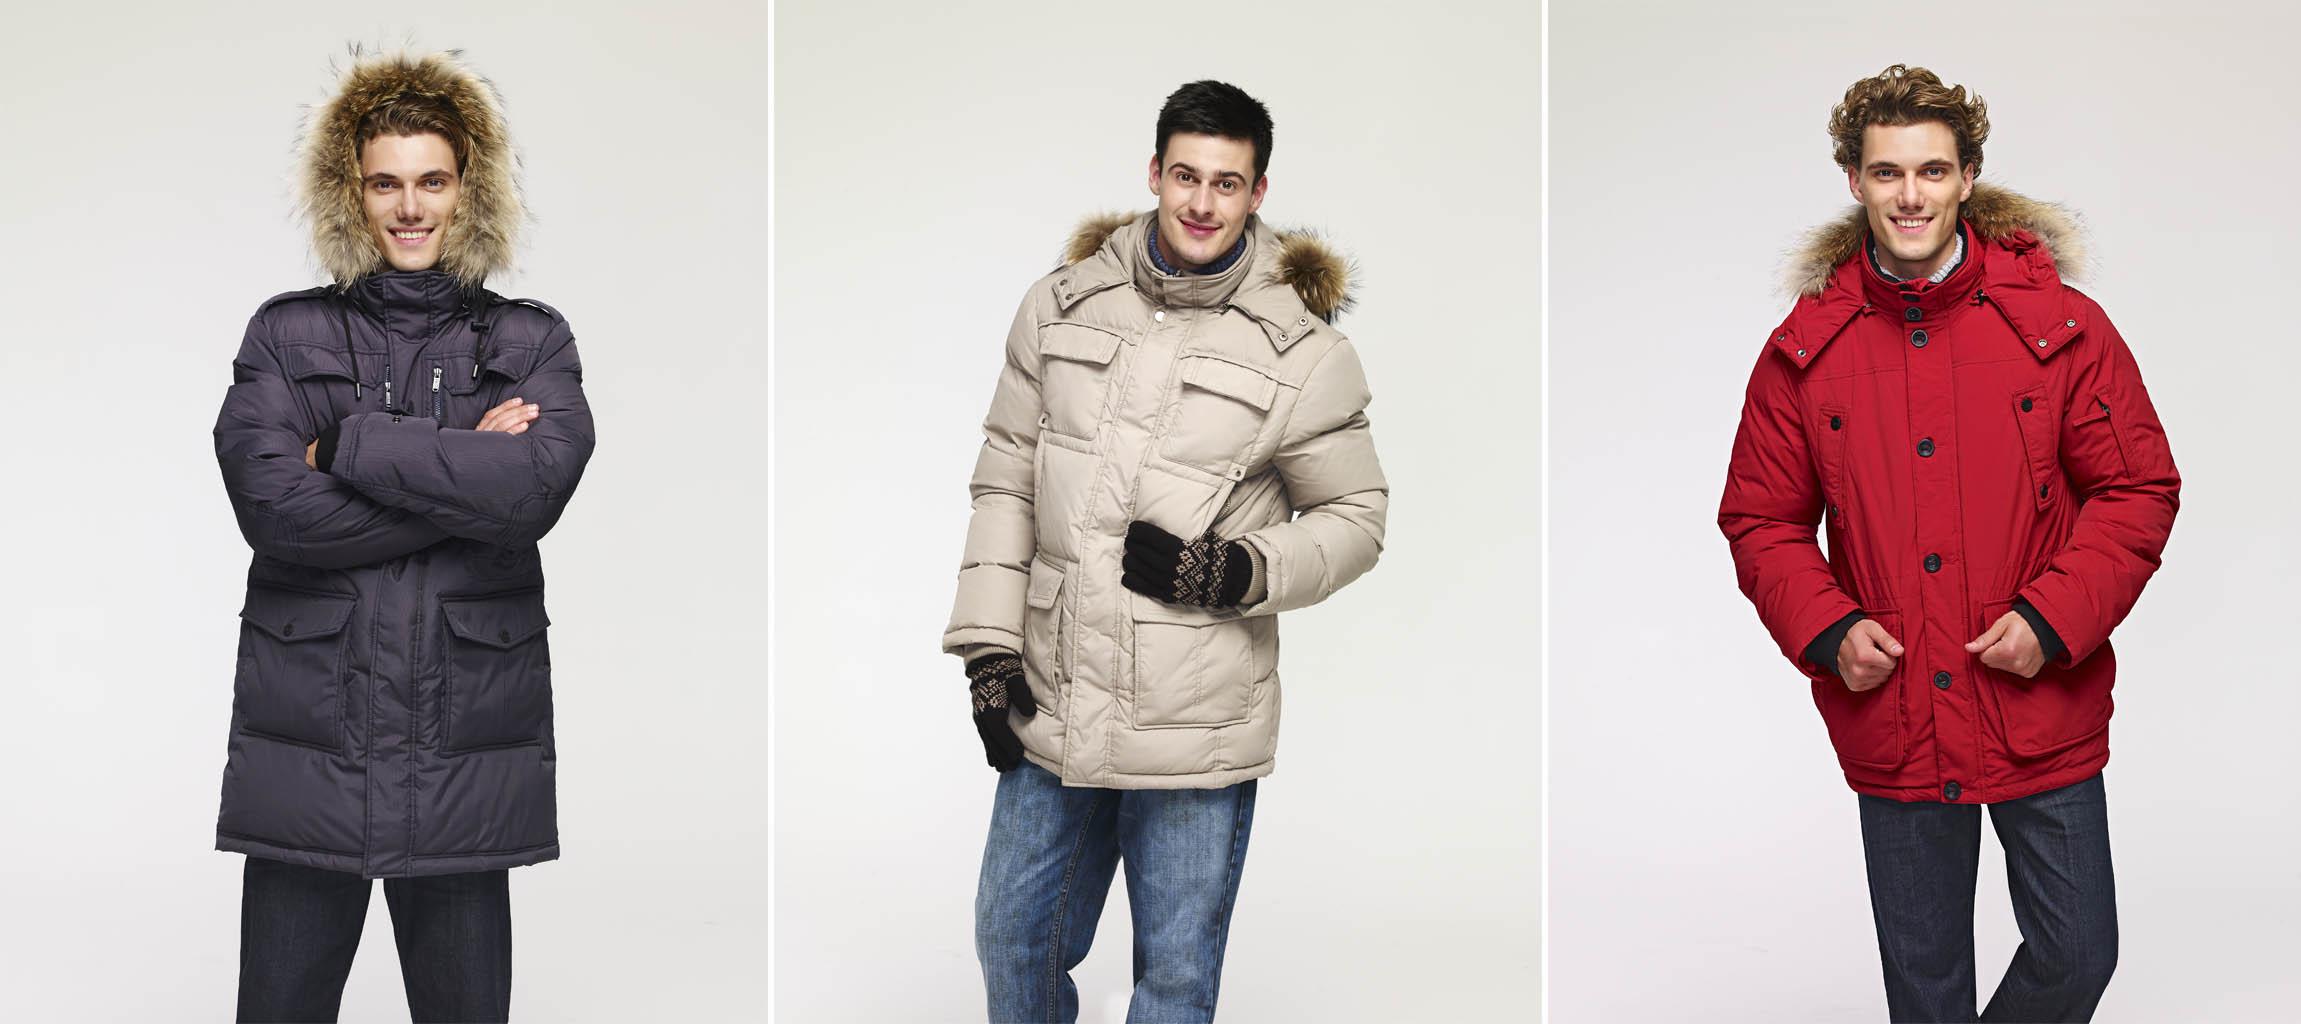 осень зима 2015 мода верхняя одежда фото